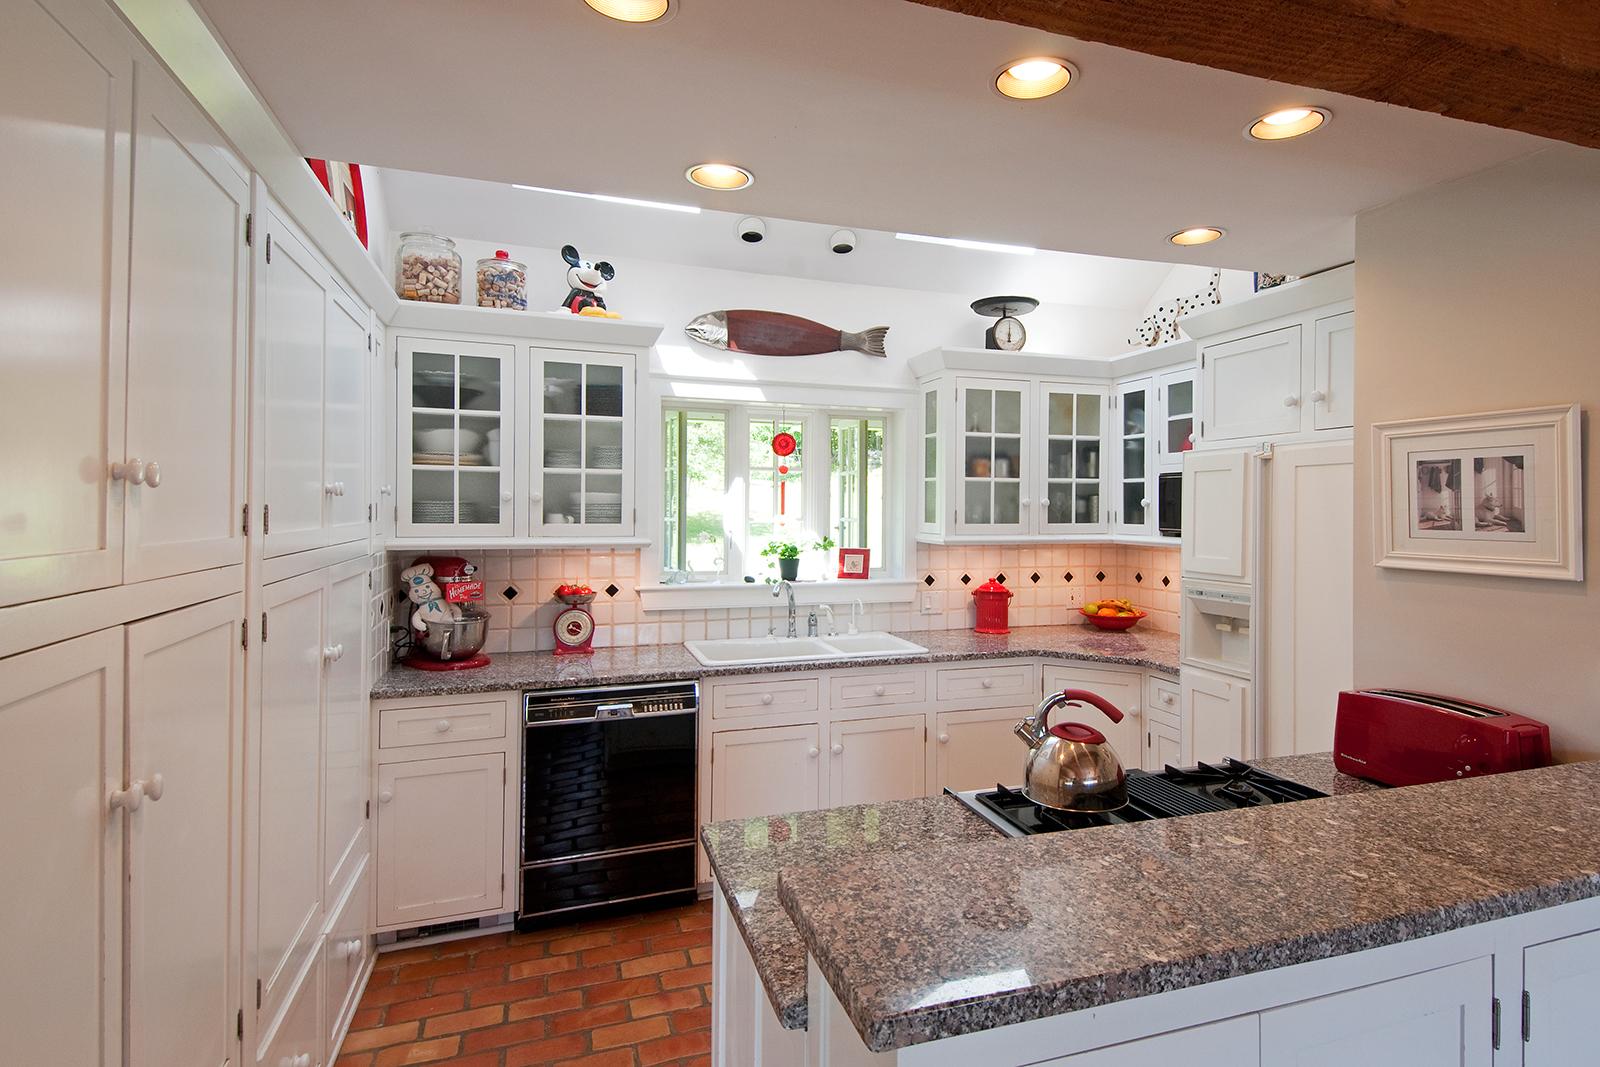 kitchen lighting design overhead kitchen lighting Kitchen Lighting Design Kitchen Lighting Design Guidelines HouseLogic